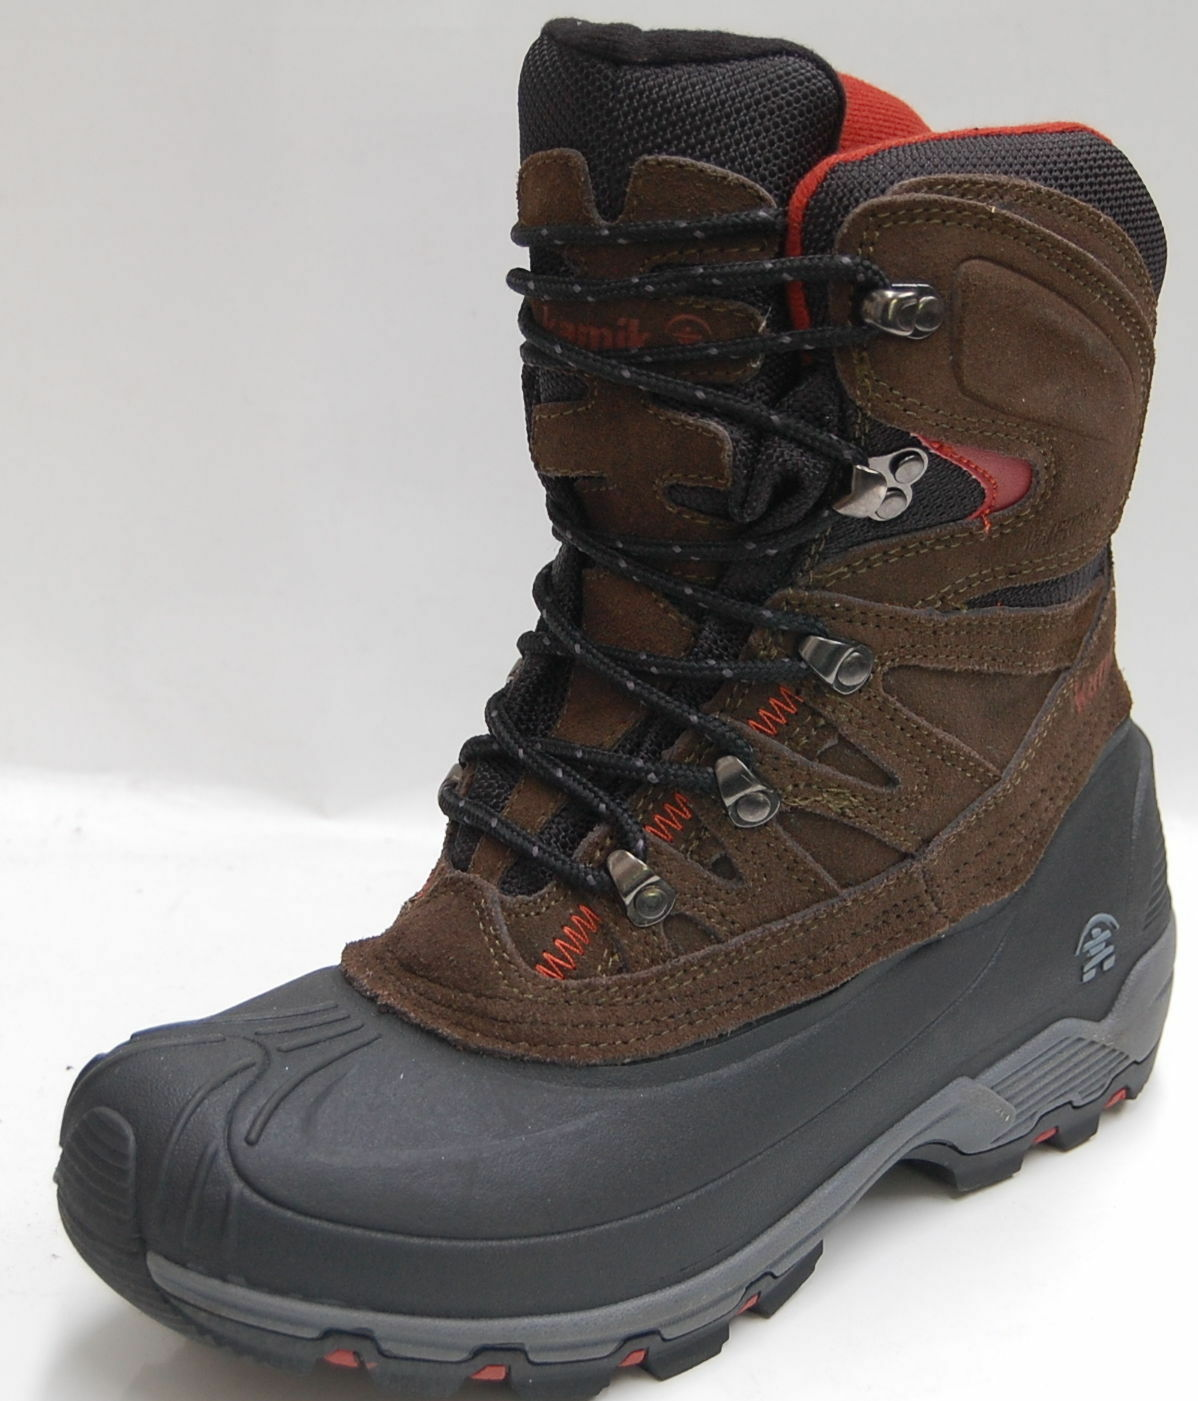 KAMIK Nordicpass olive Canadian Boots -50°C waterproof Gr. 9 / 42 / 26cm